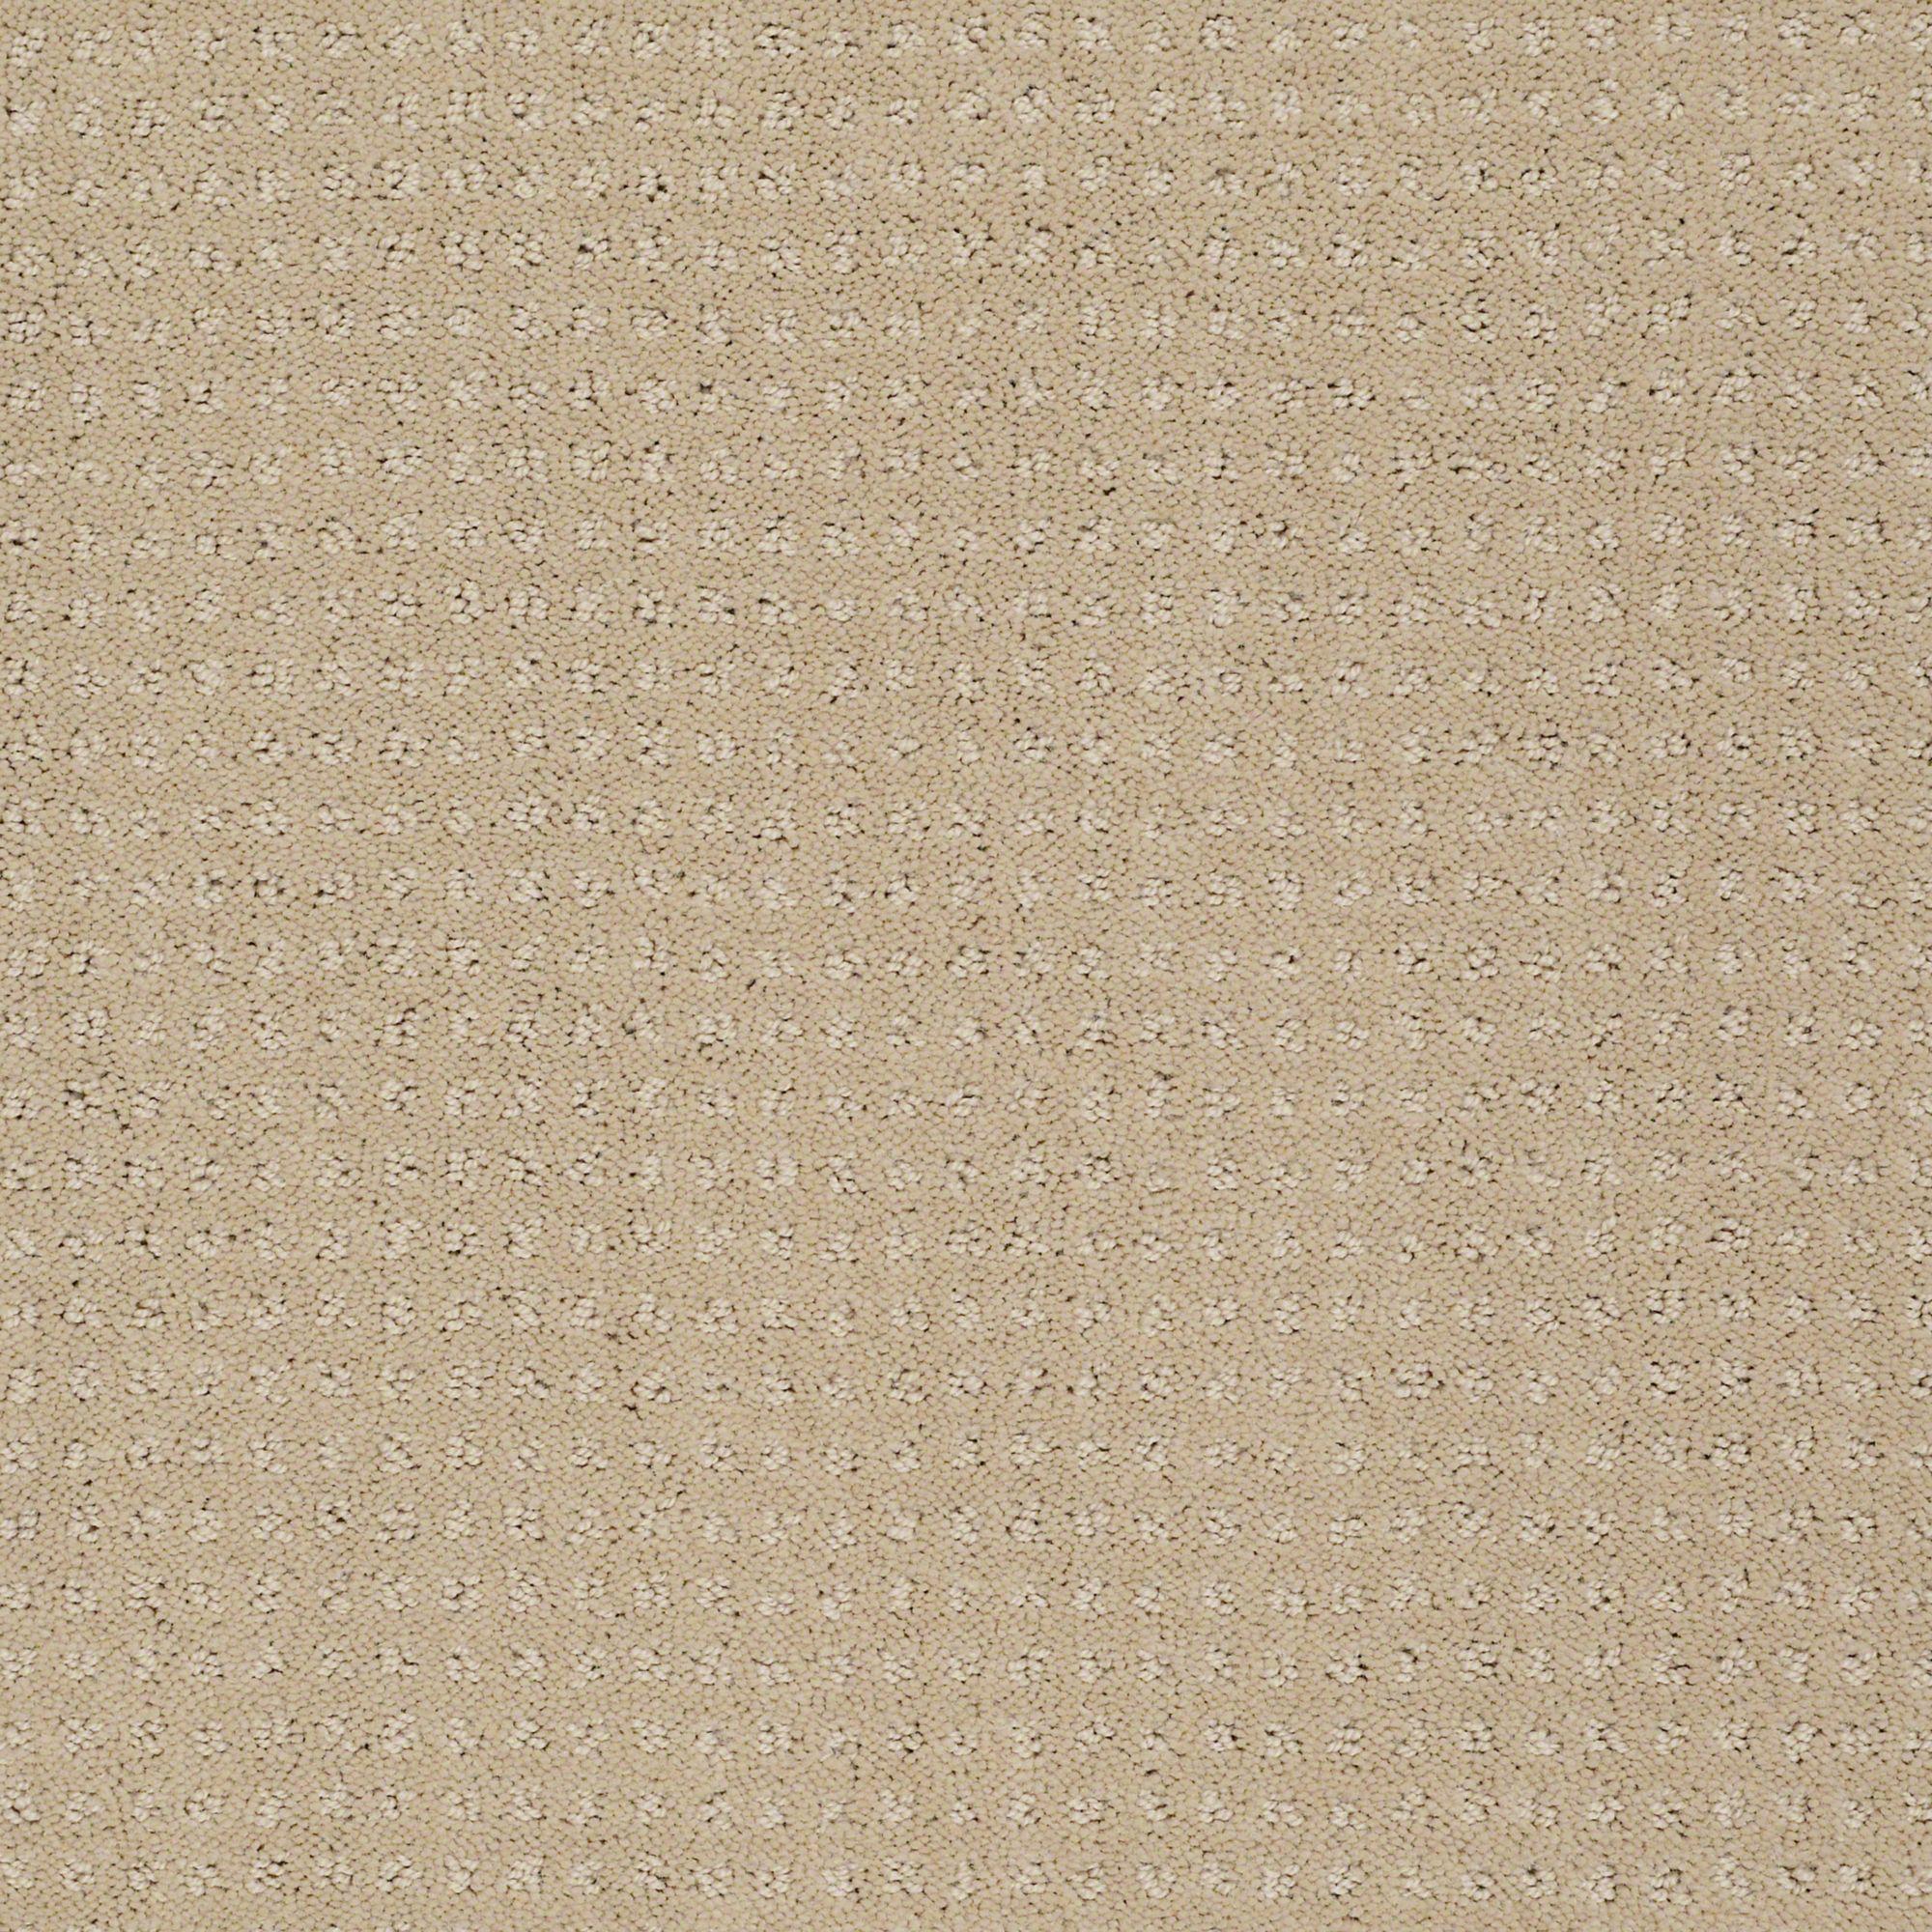 My Choice Pattern Taffeta Carpet samples, Textured